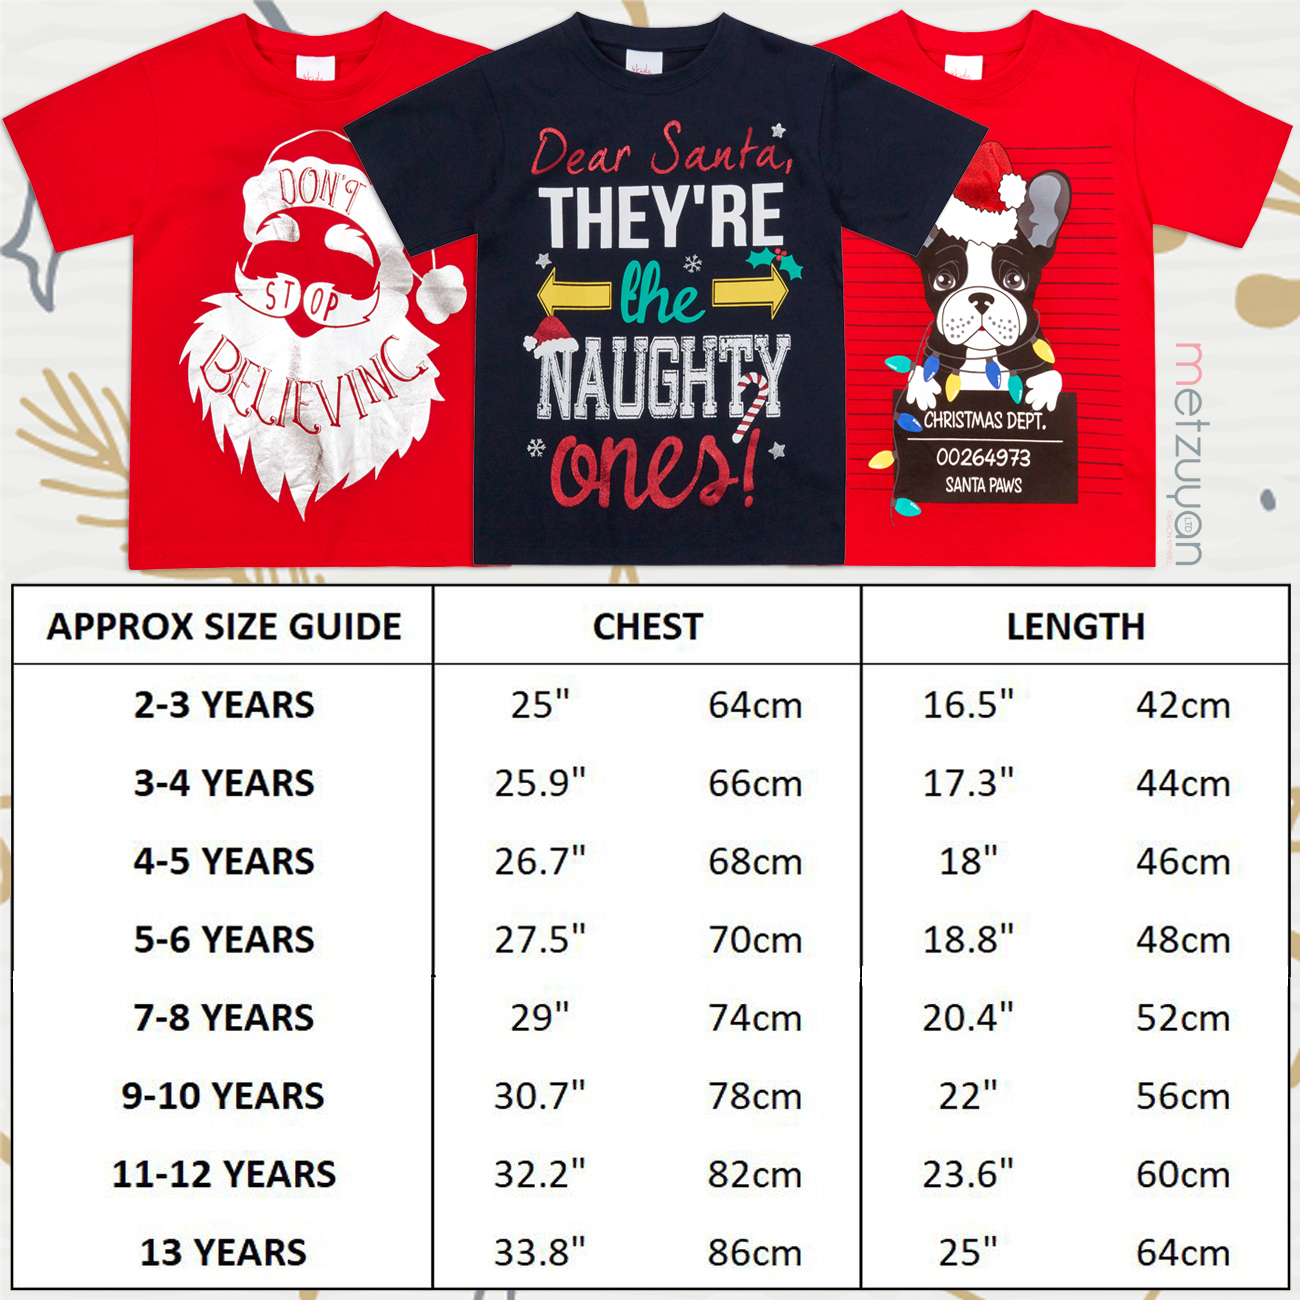 Childrens-Girls-Boys-Xmas-T-Shirts-Printed-Christmas-Design-100-Cotton-2-13-Yrs thumbnail 26